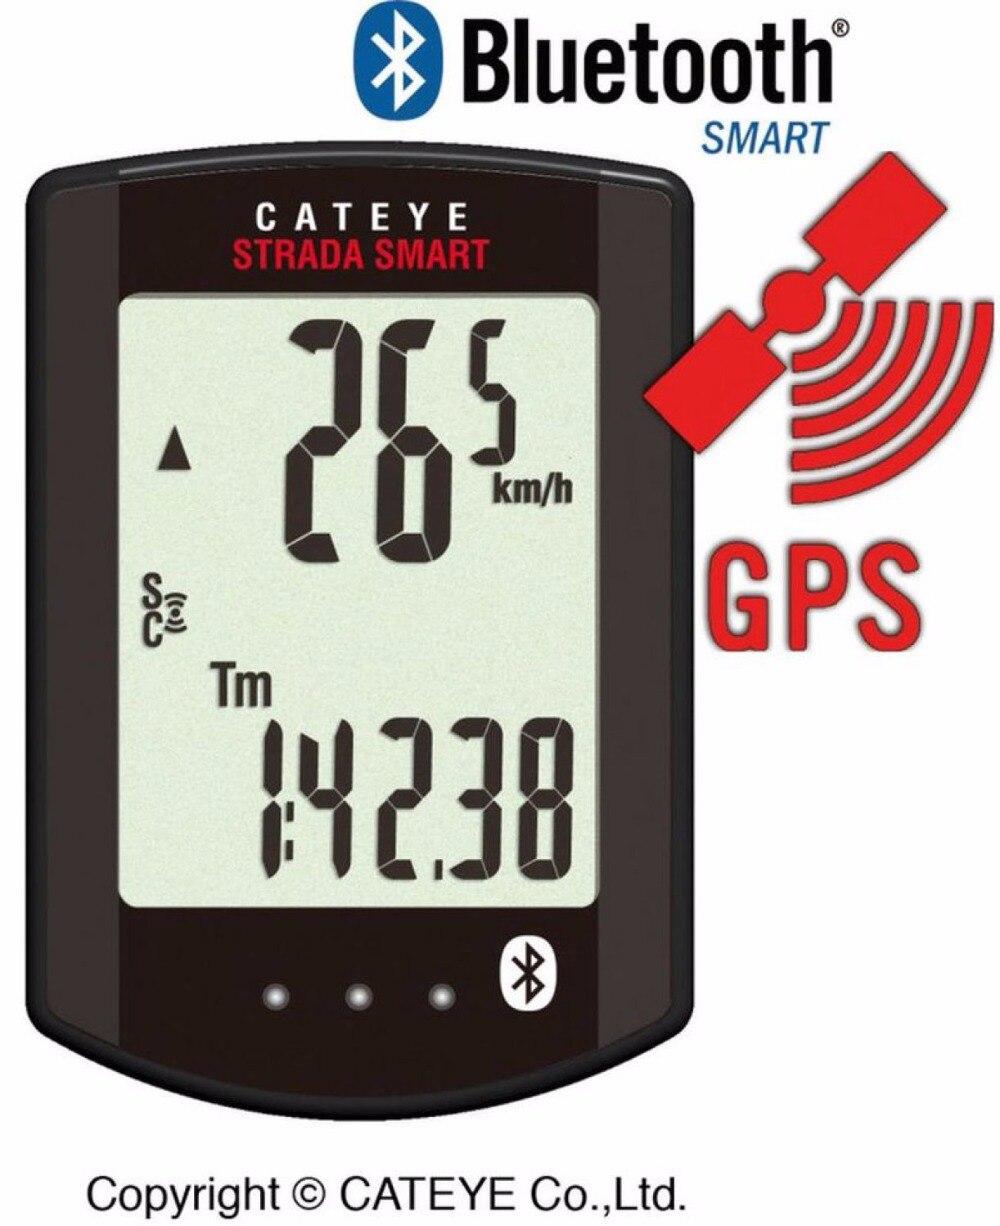 CATEYE Smart <font><b>Bluetooth</b></font> wireless heart rate <font><b>cadence</b></font> CC-RD500B Cycling <font><b>Bike</b></font> Bicycle Computer